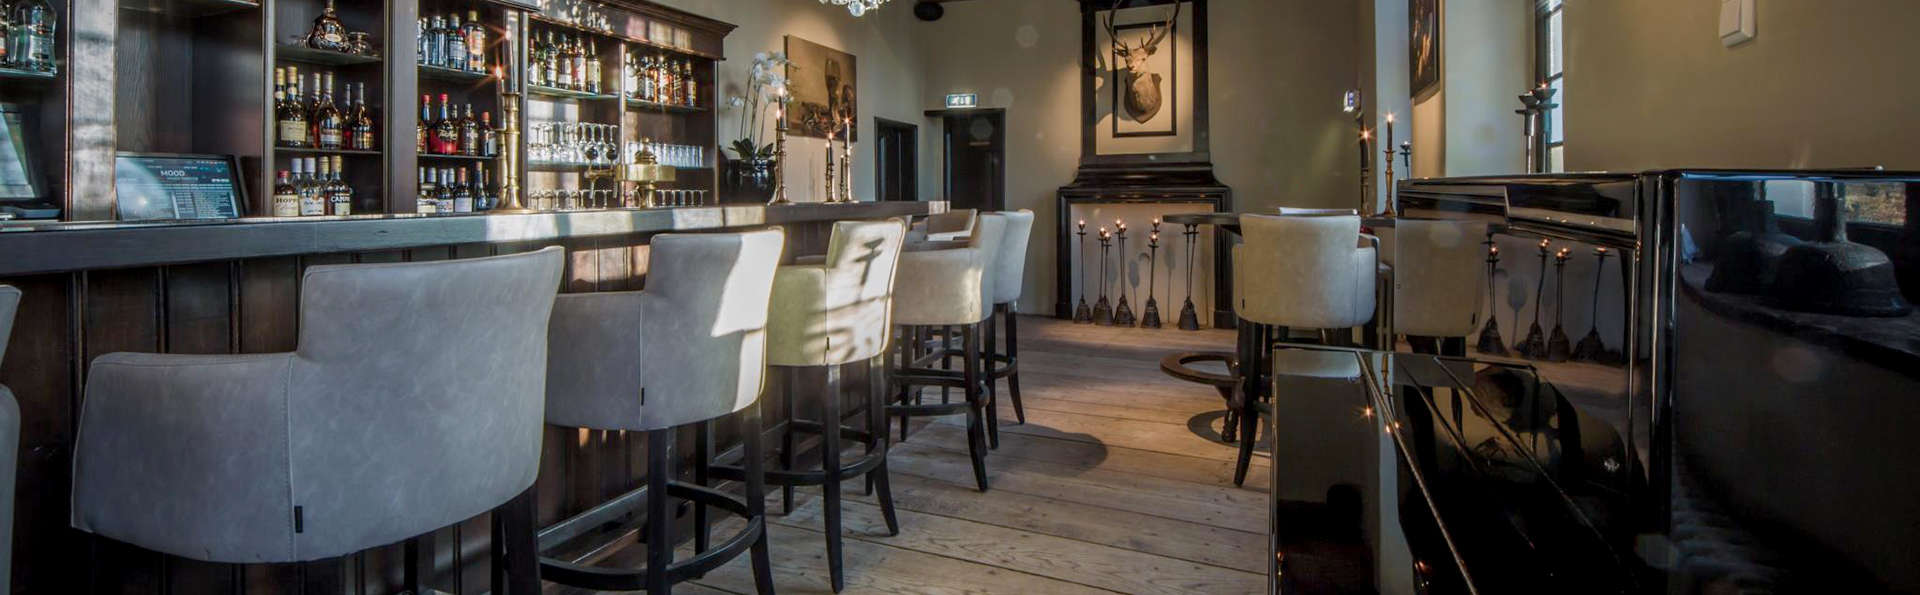 Fletcher Landgoedhotel Renesse - EDIT_Bar.jpg